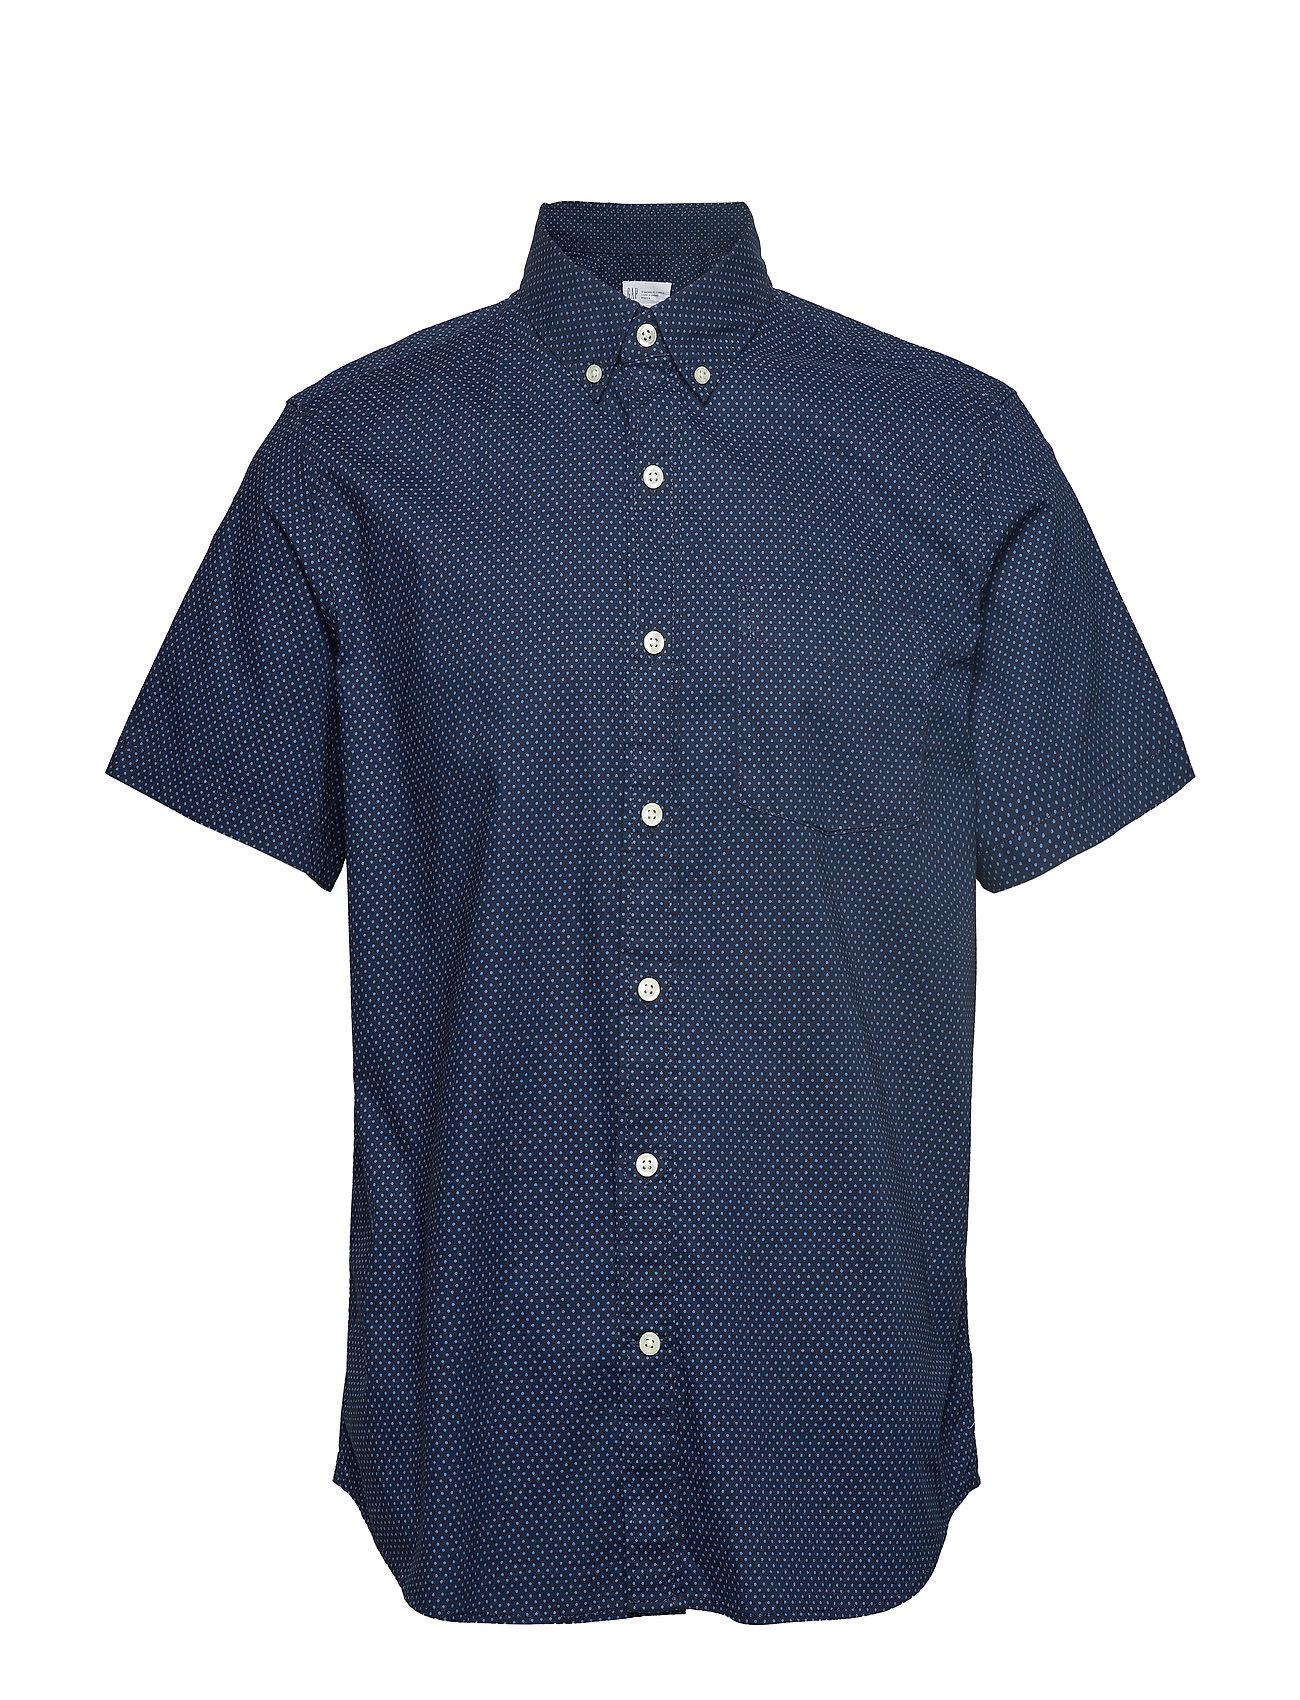 GAP Lived-In Stretch Poplin Short Sleeve Shirt - BLUE DOT